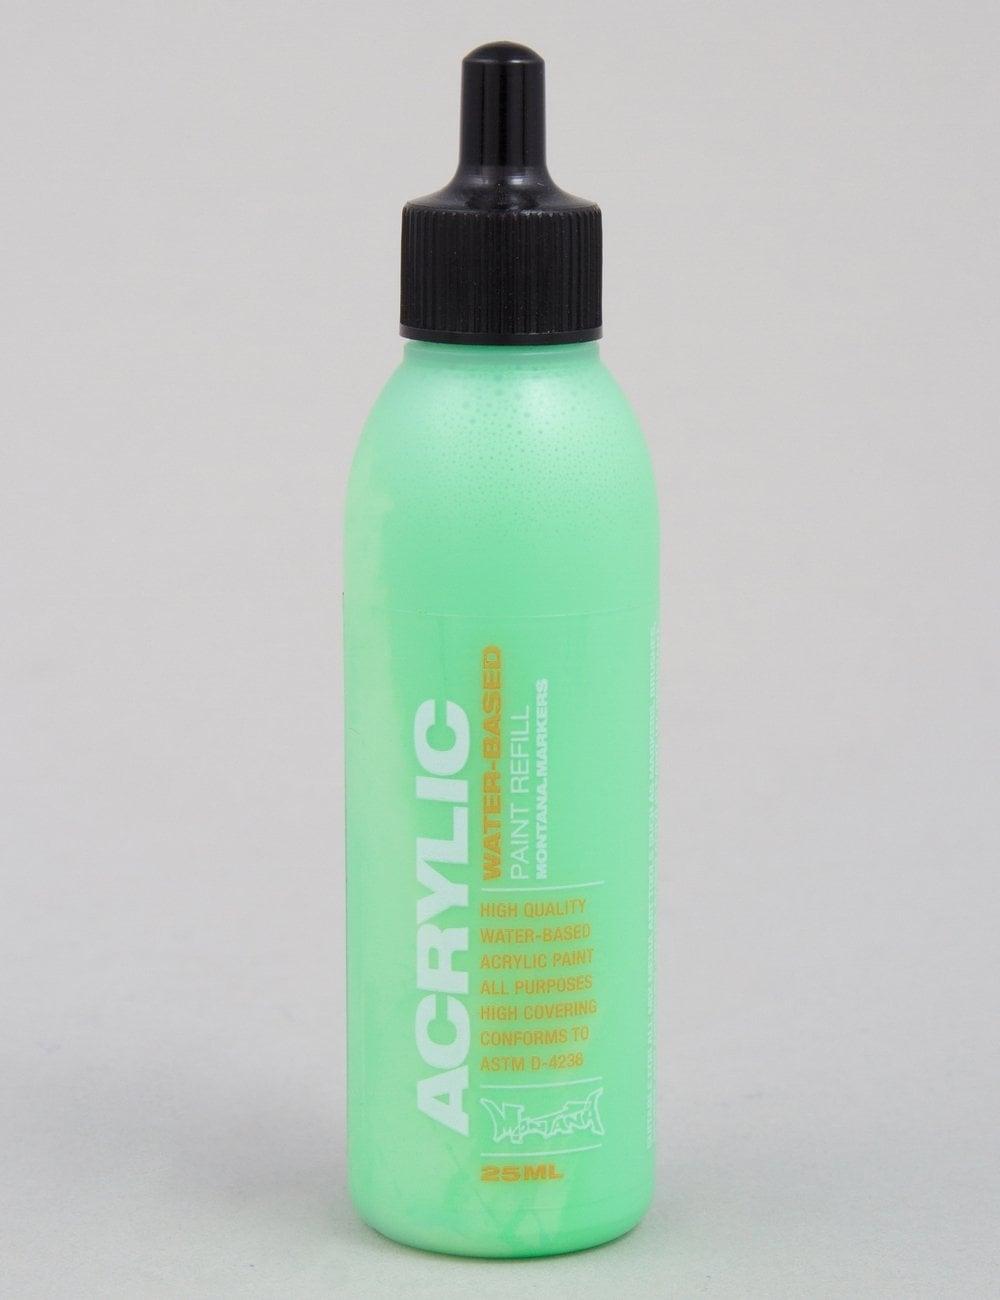 Montana gold fluoro acid green 25ml paint refill spray paint supplies from fat buddha store uk Spray paint supplies